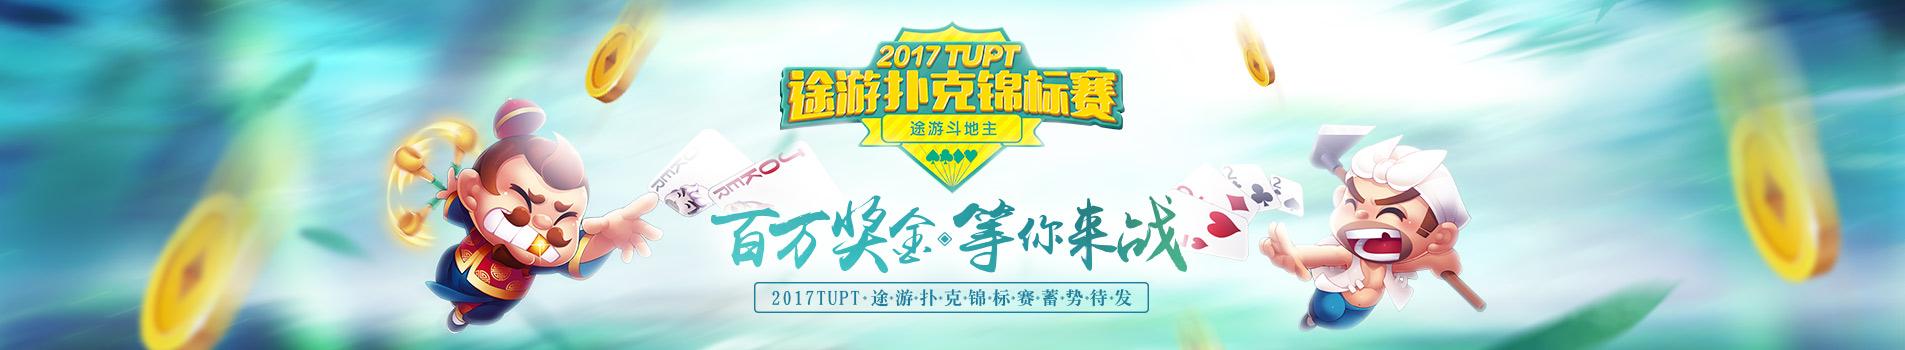 2017TUPT途游扑克锦标赛